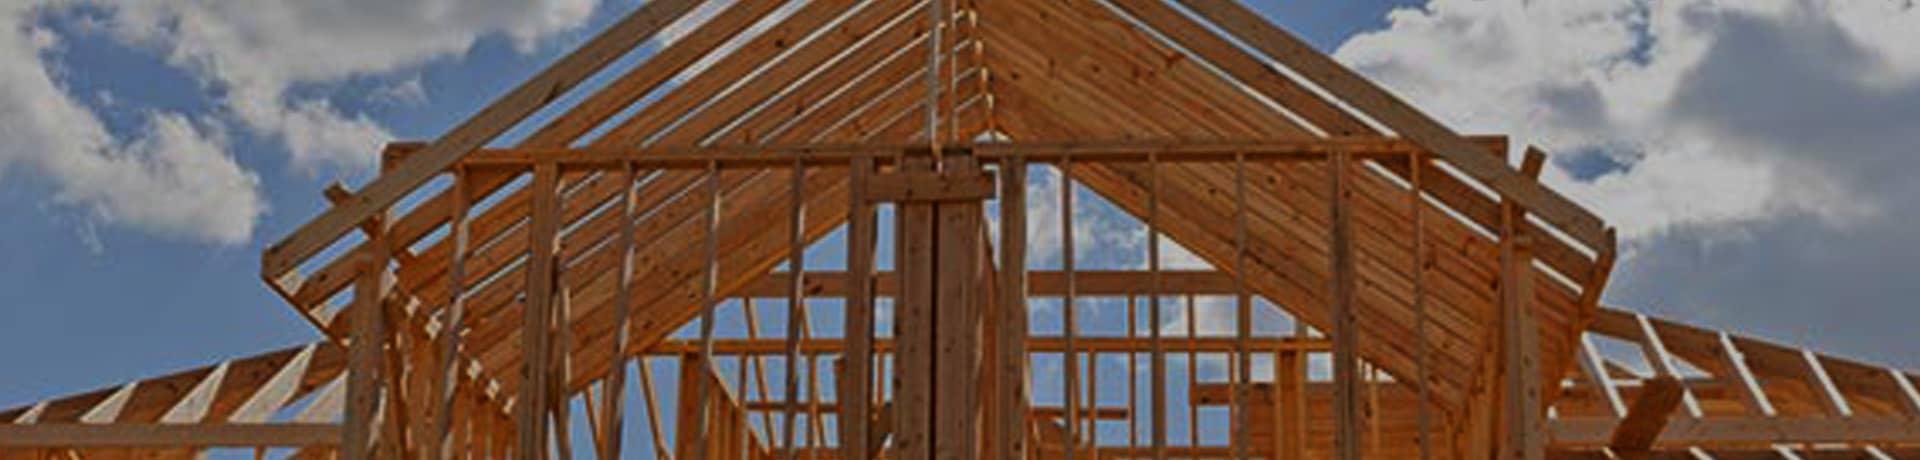 New Homes & Rebate Program banner image